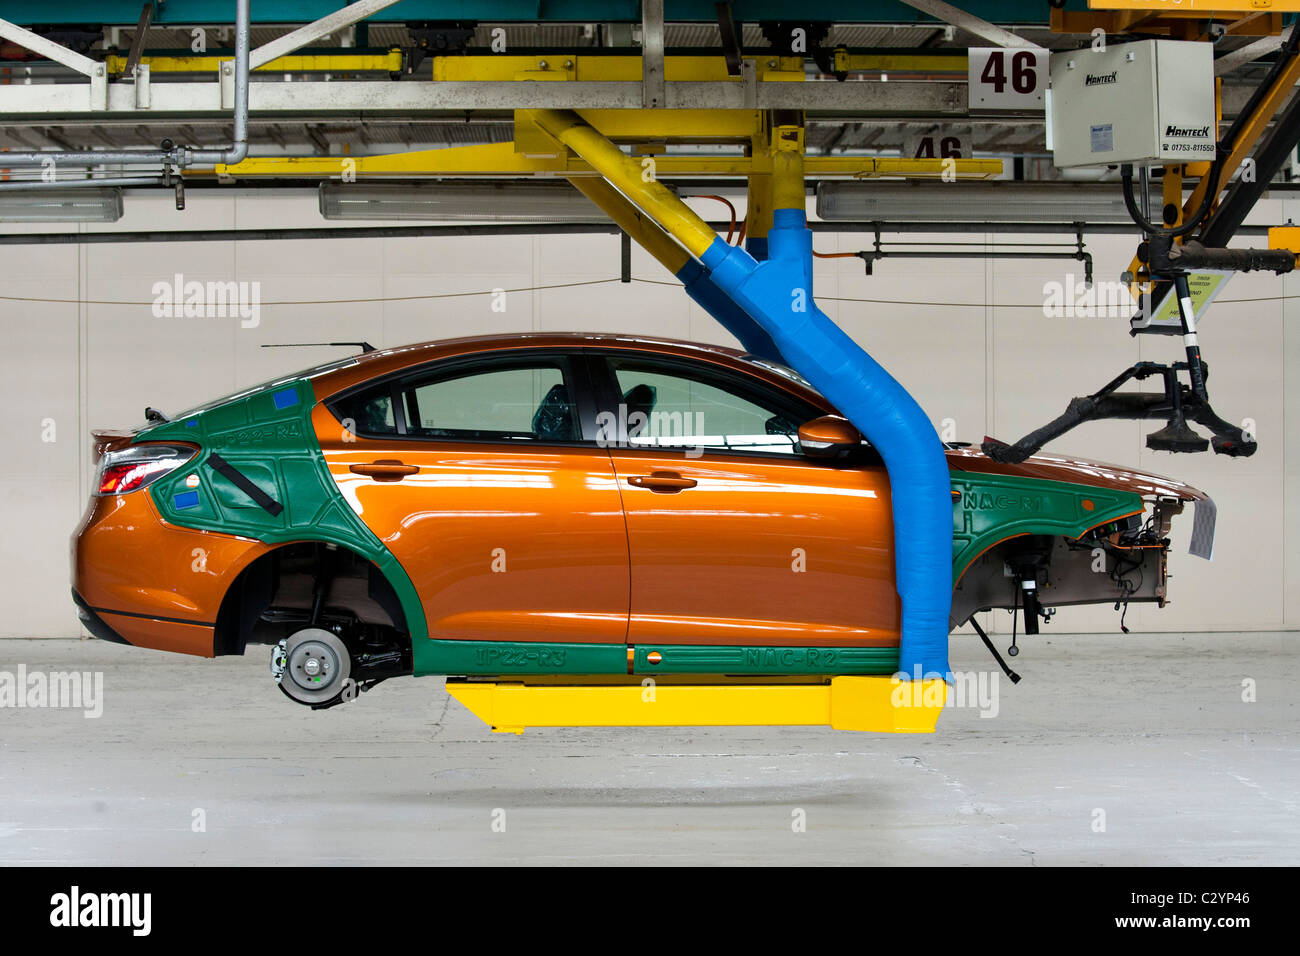 The MG6 production line at Longbridge in Birmingham UK. - Stock Image